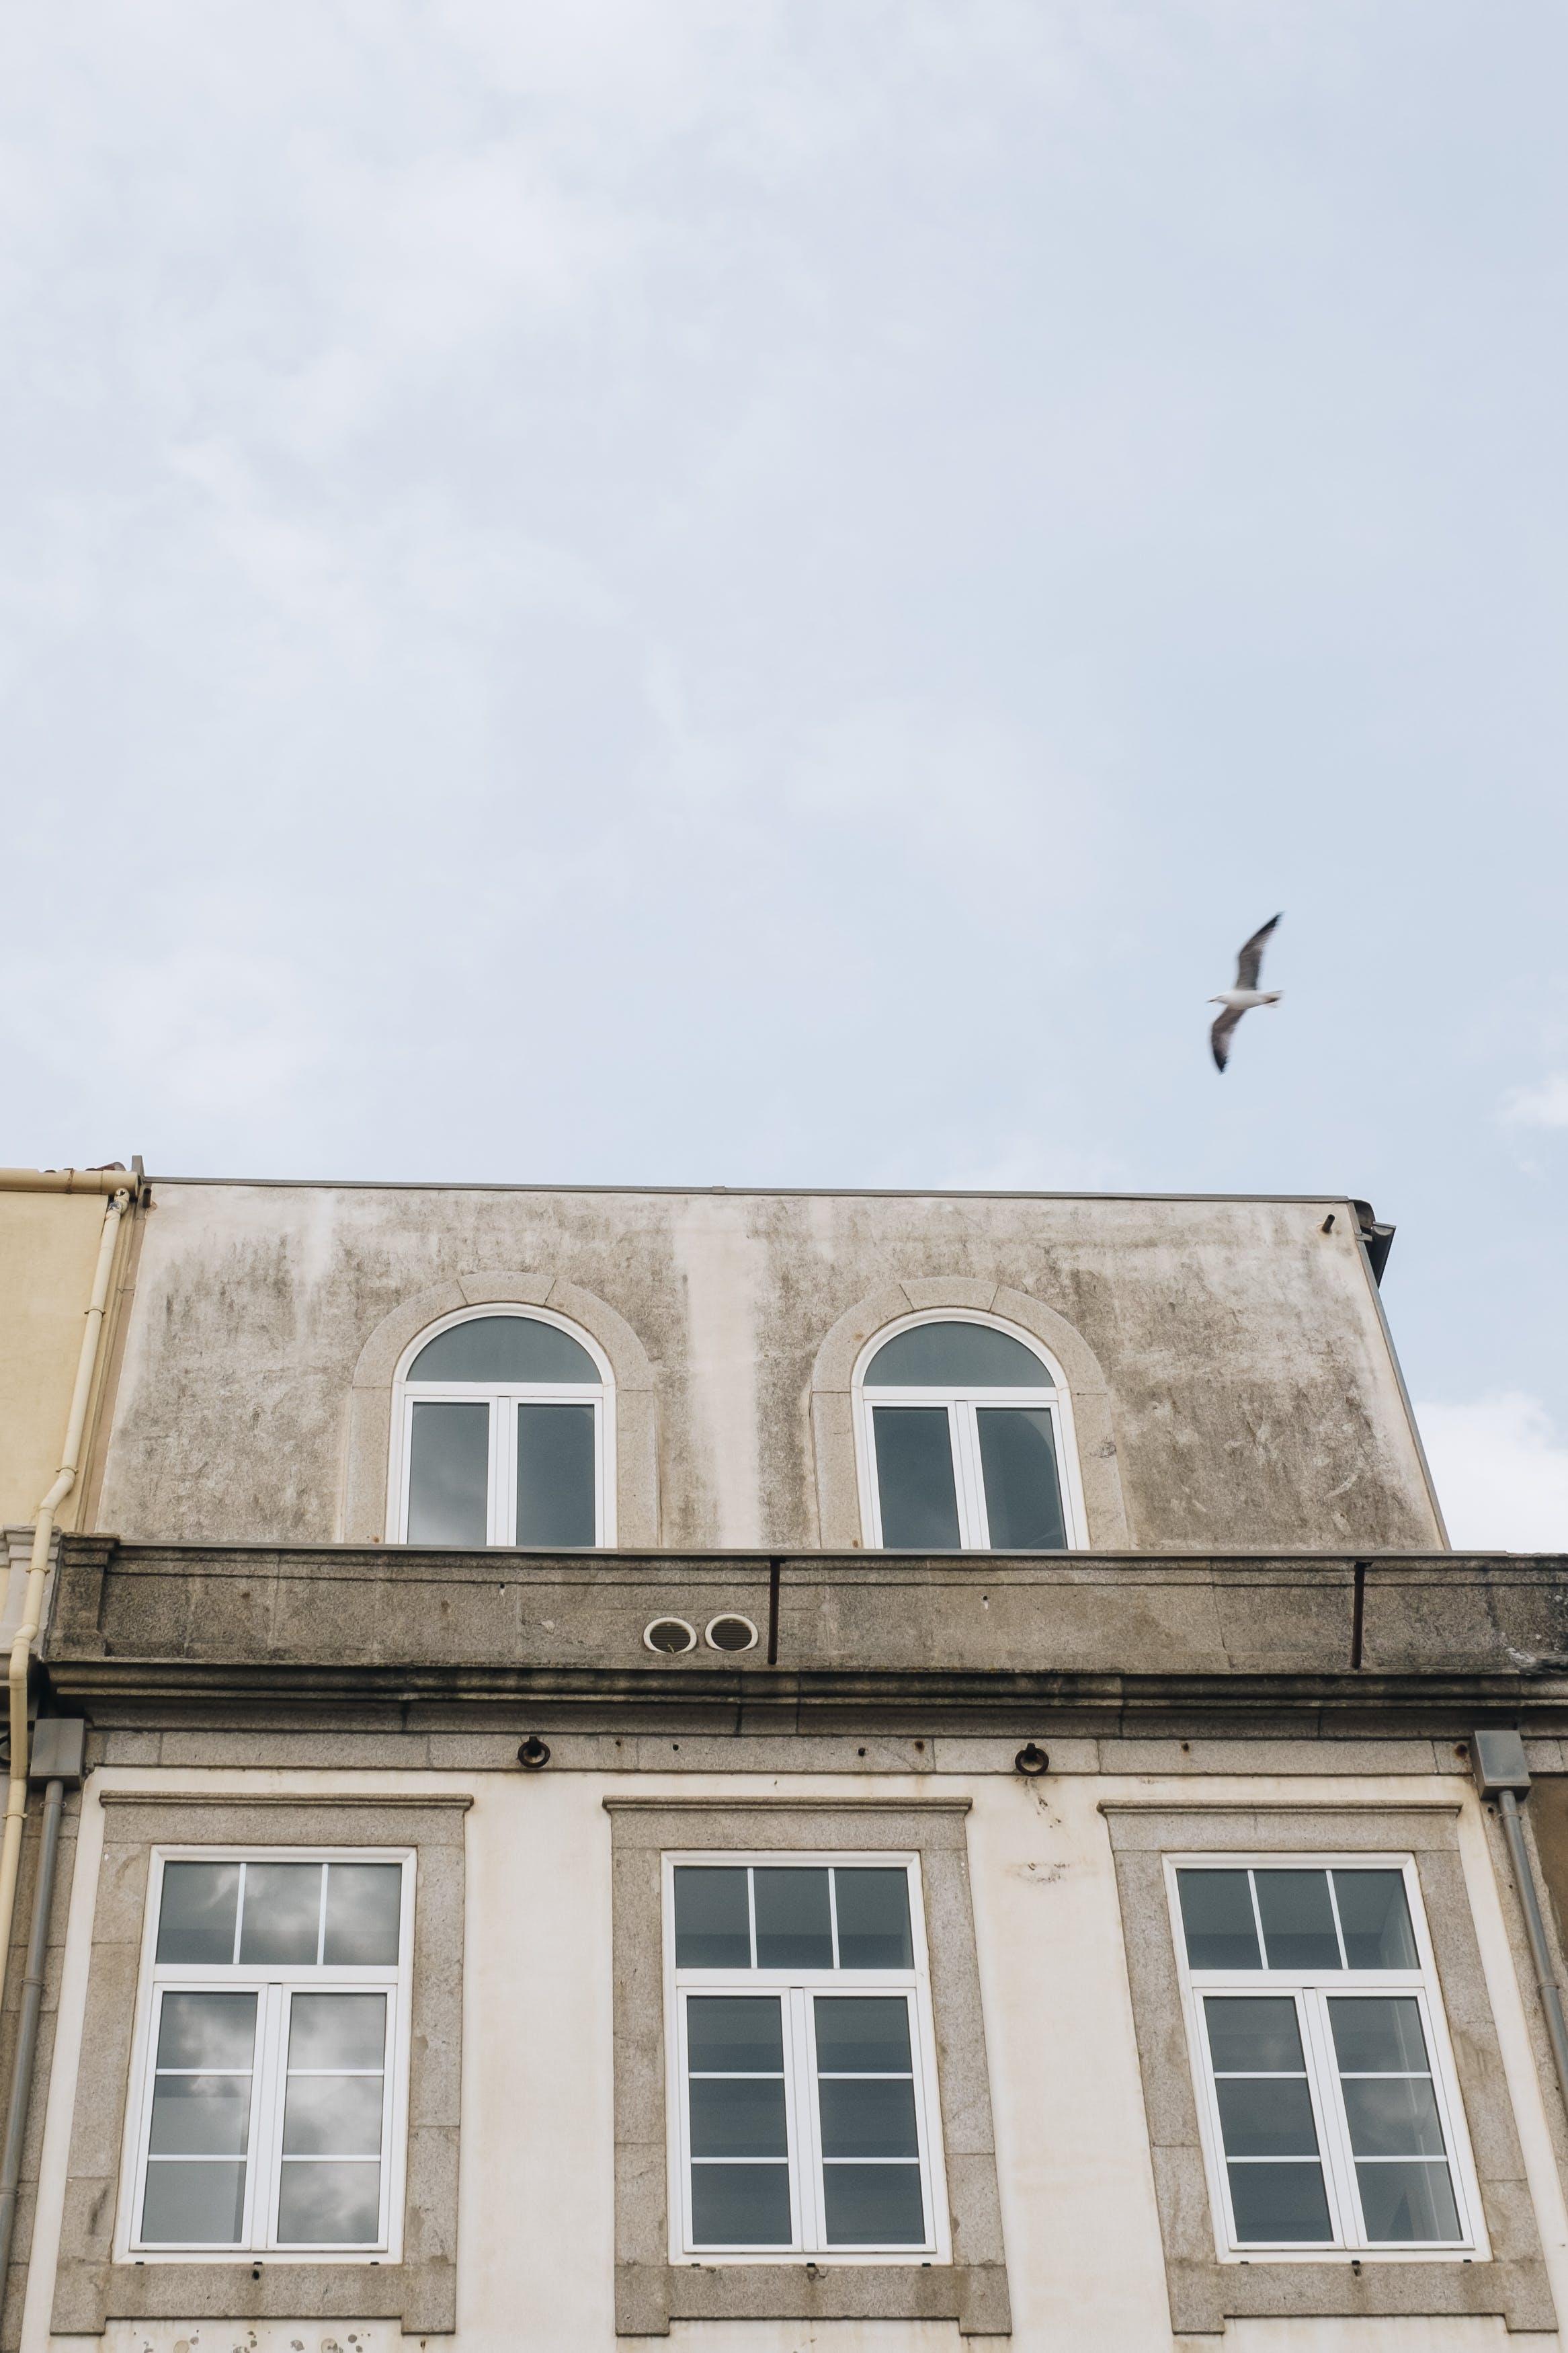 apartmán, architektura, budova